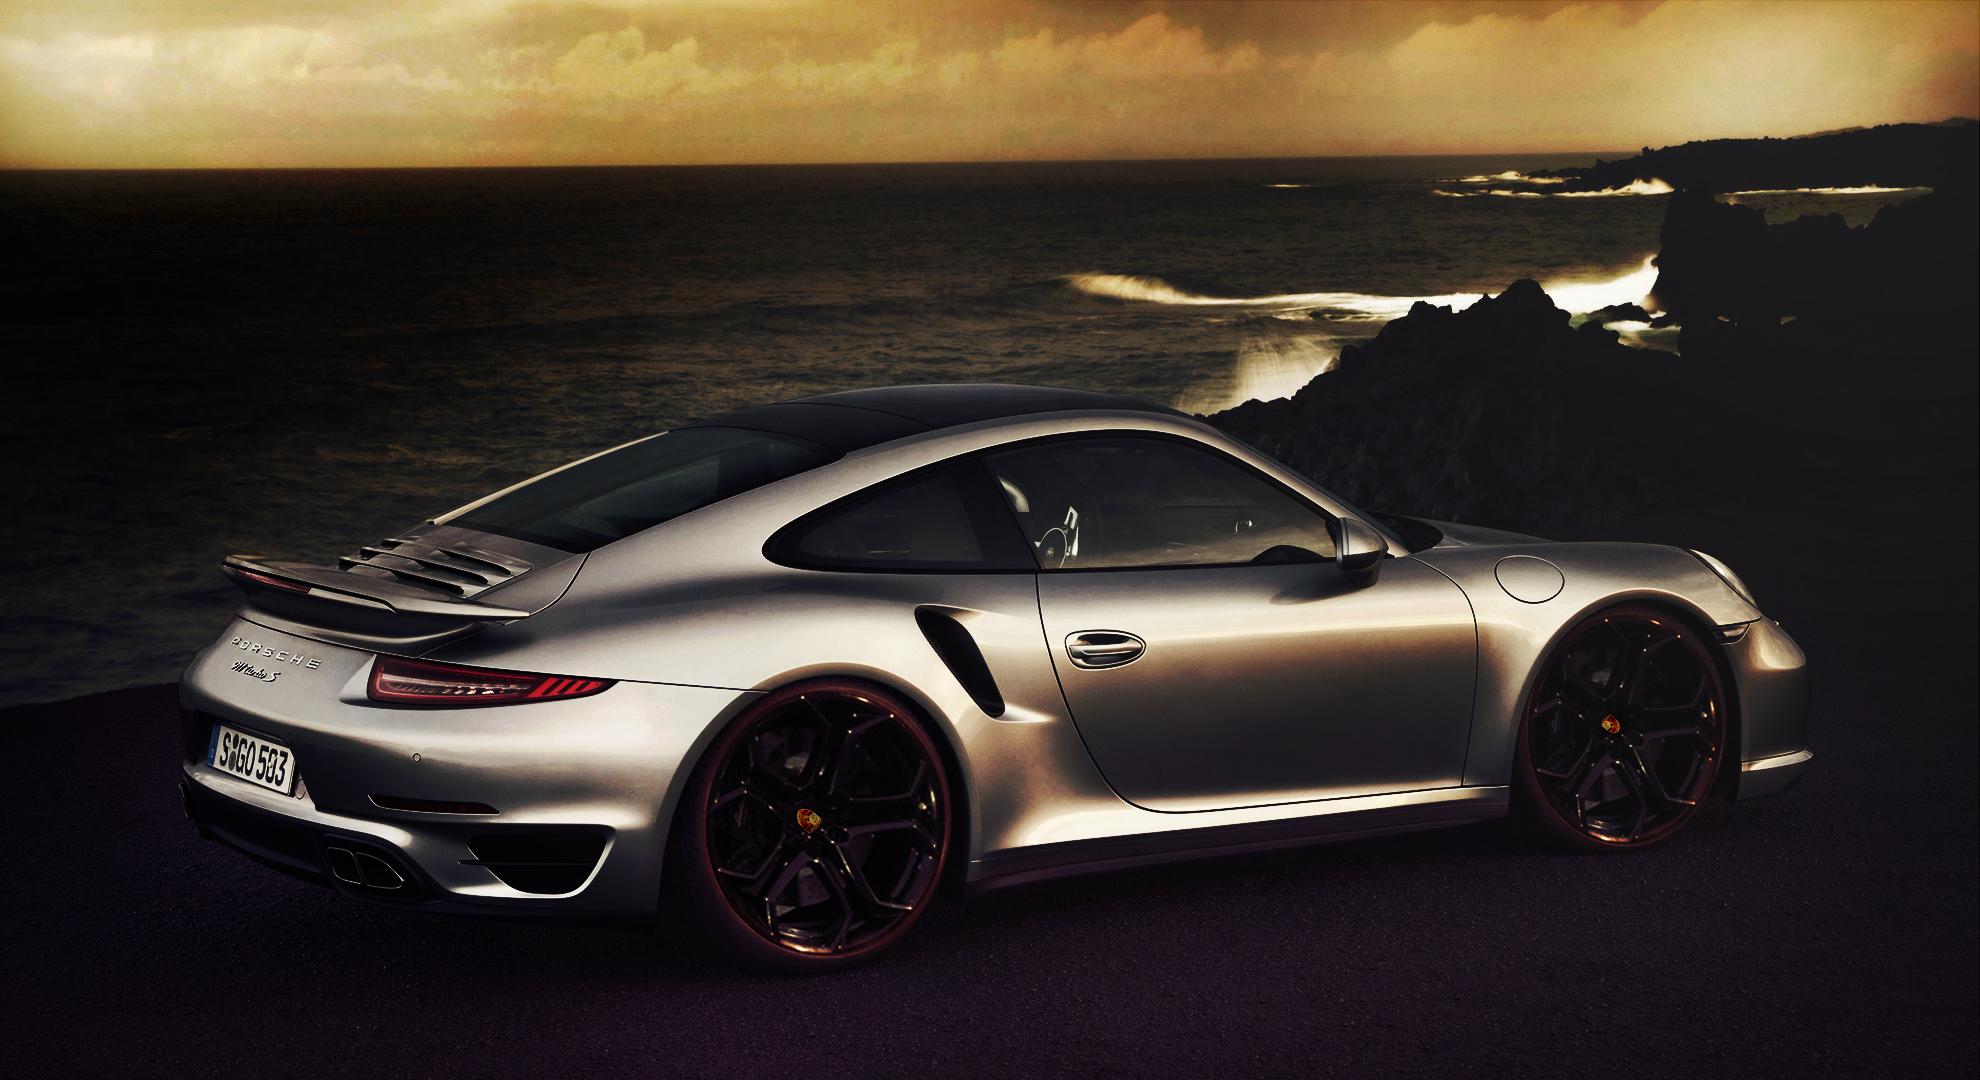 Porsche 911 Turbo S Wallpaper Wallpapersafari